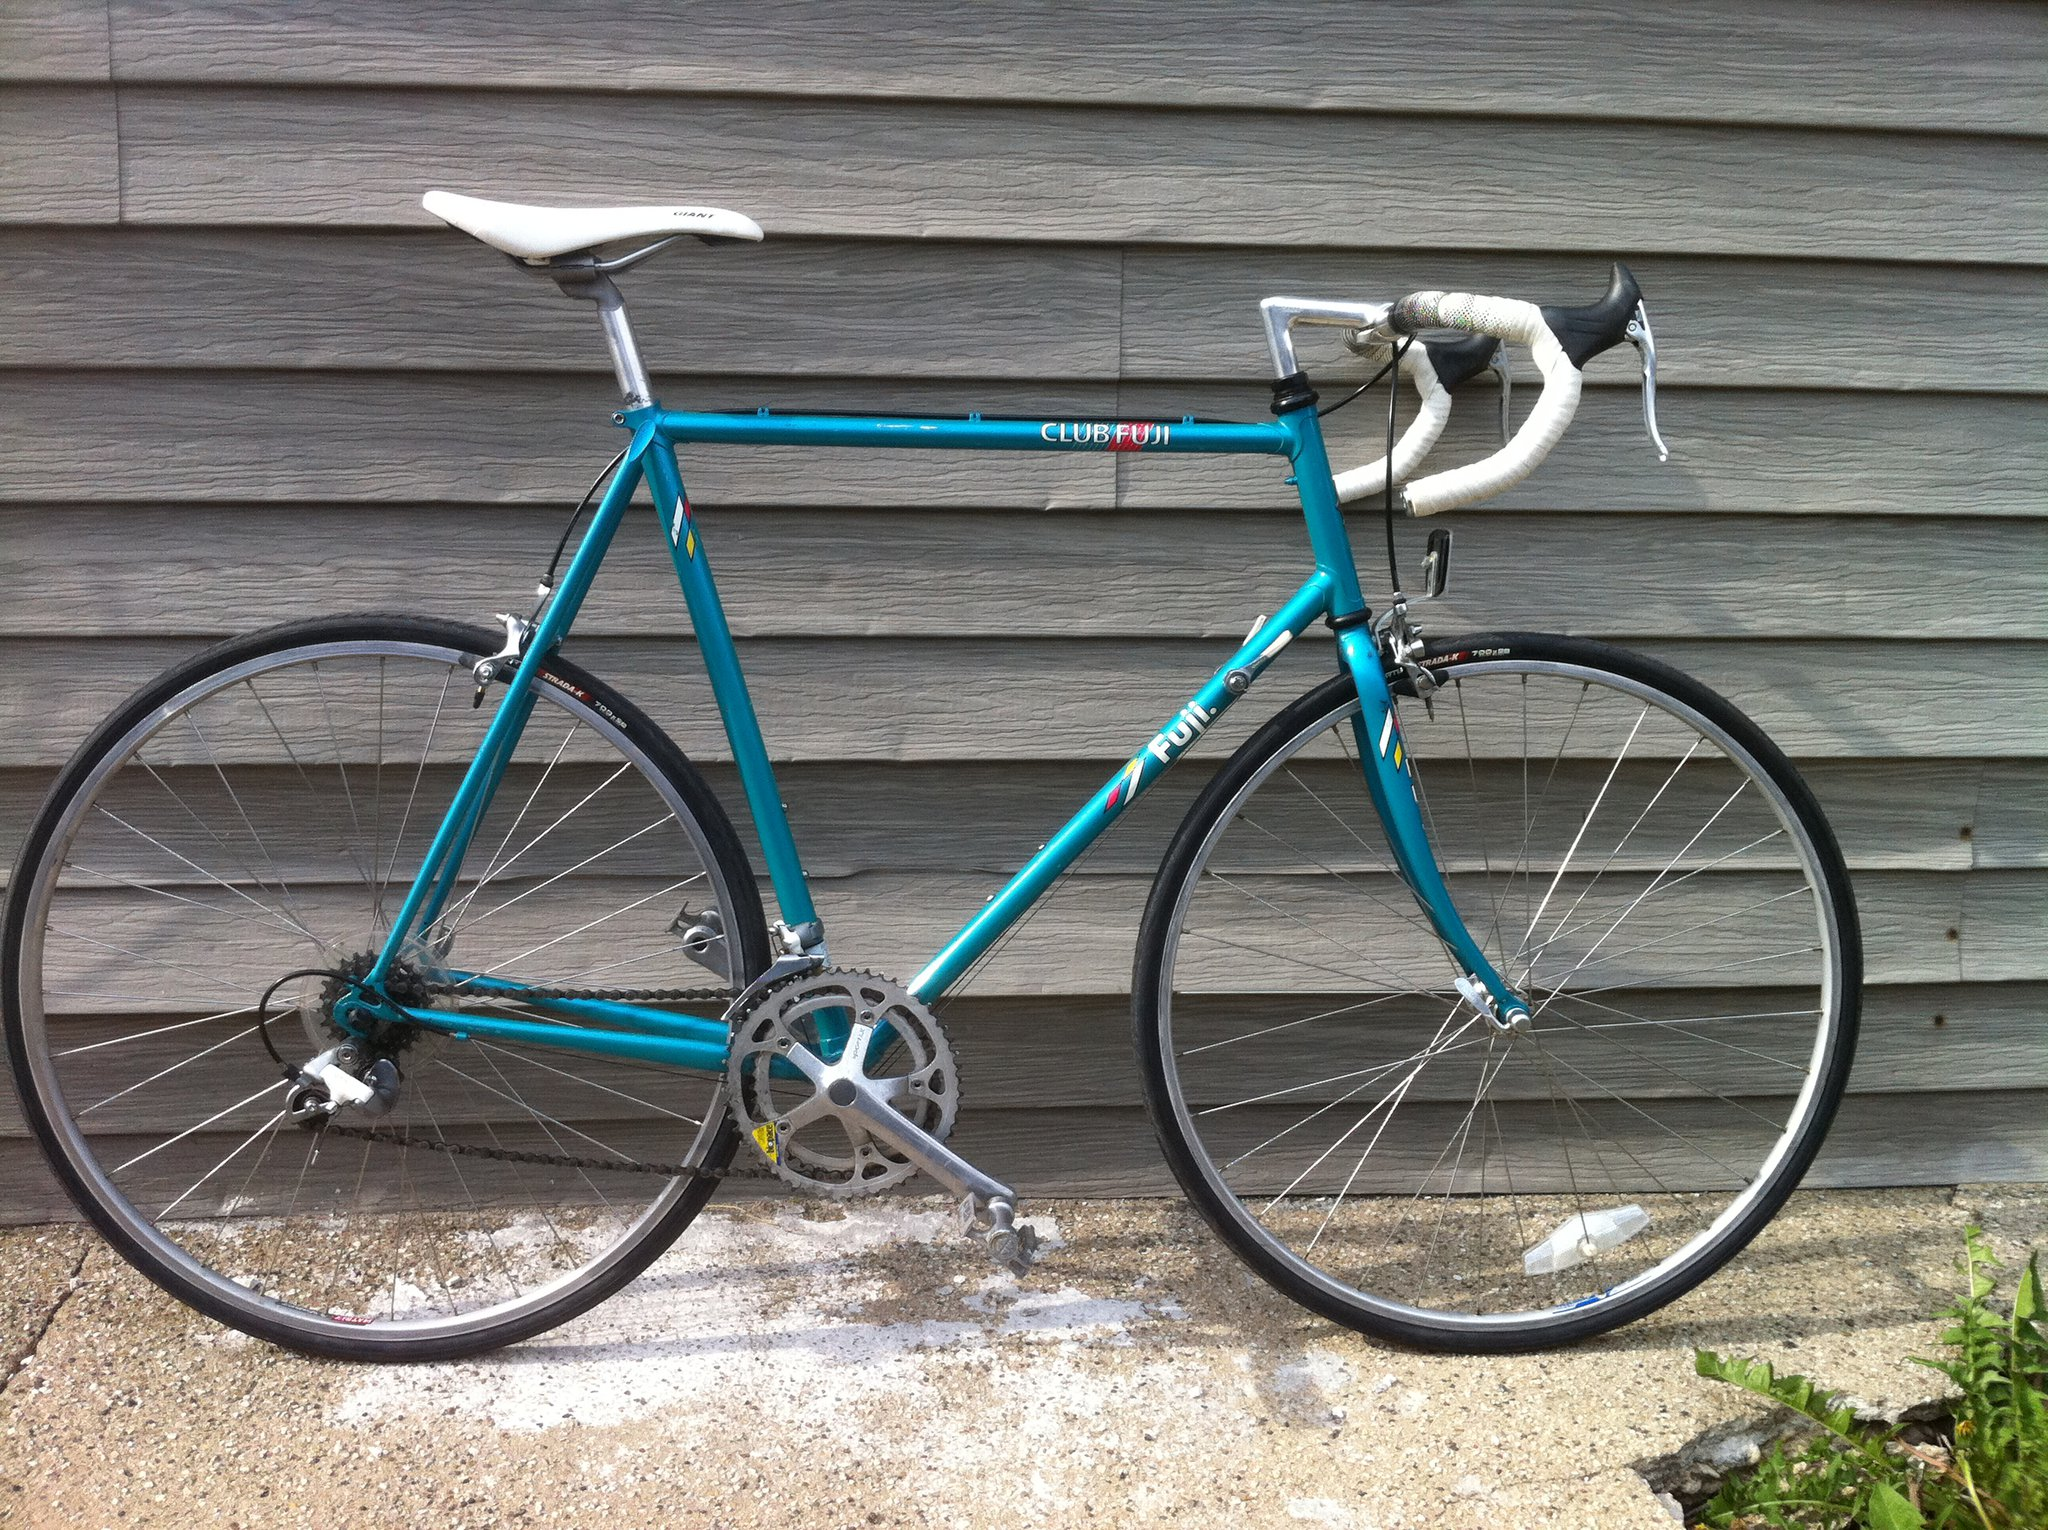 1989 Club Fuji | Chicago Stolen Bike Registry